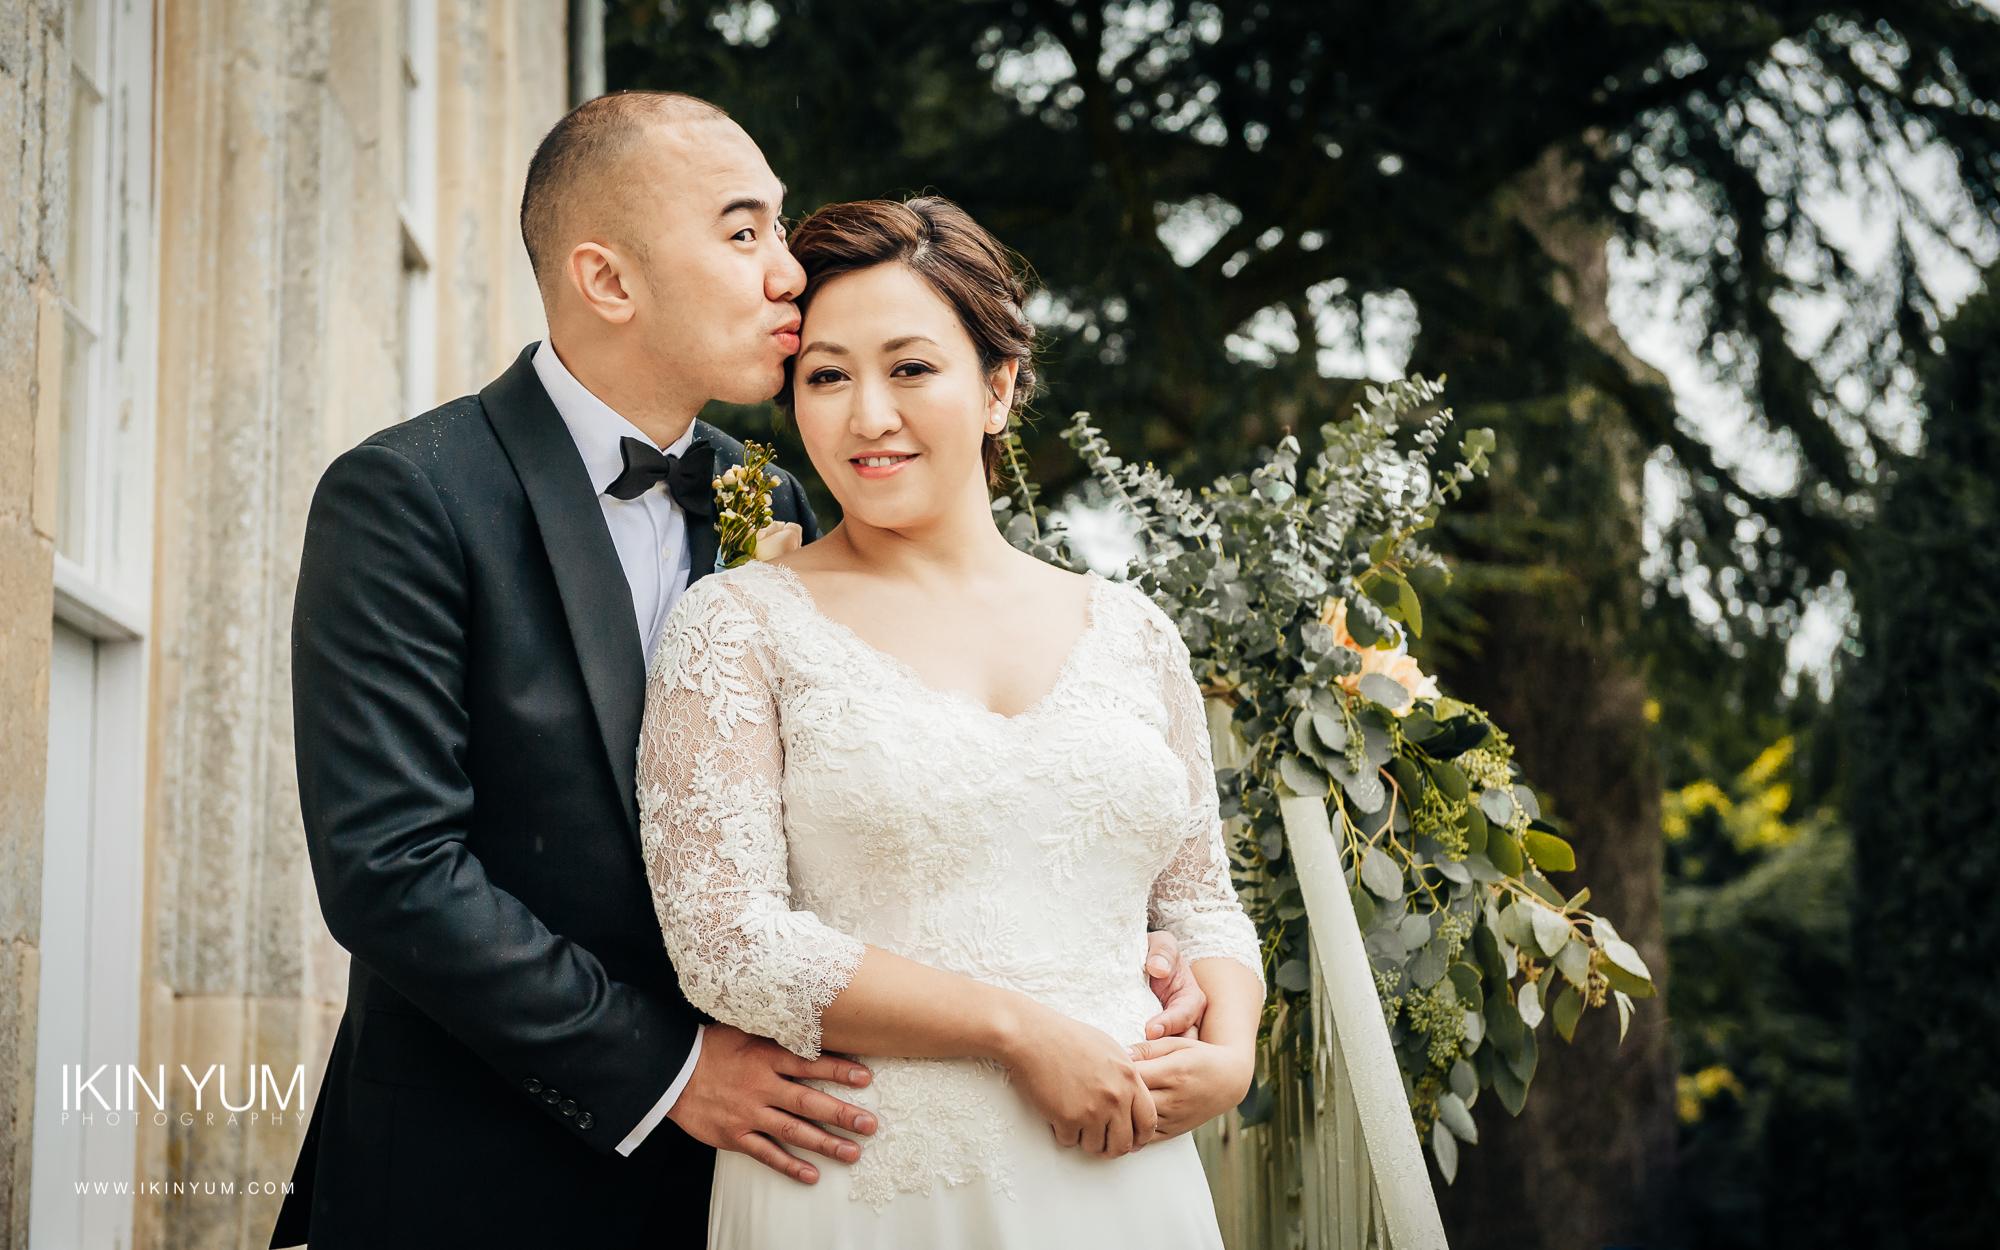 Elmore Court Wedding- Ikin Yum Photography-0078.jpg